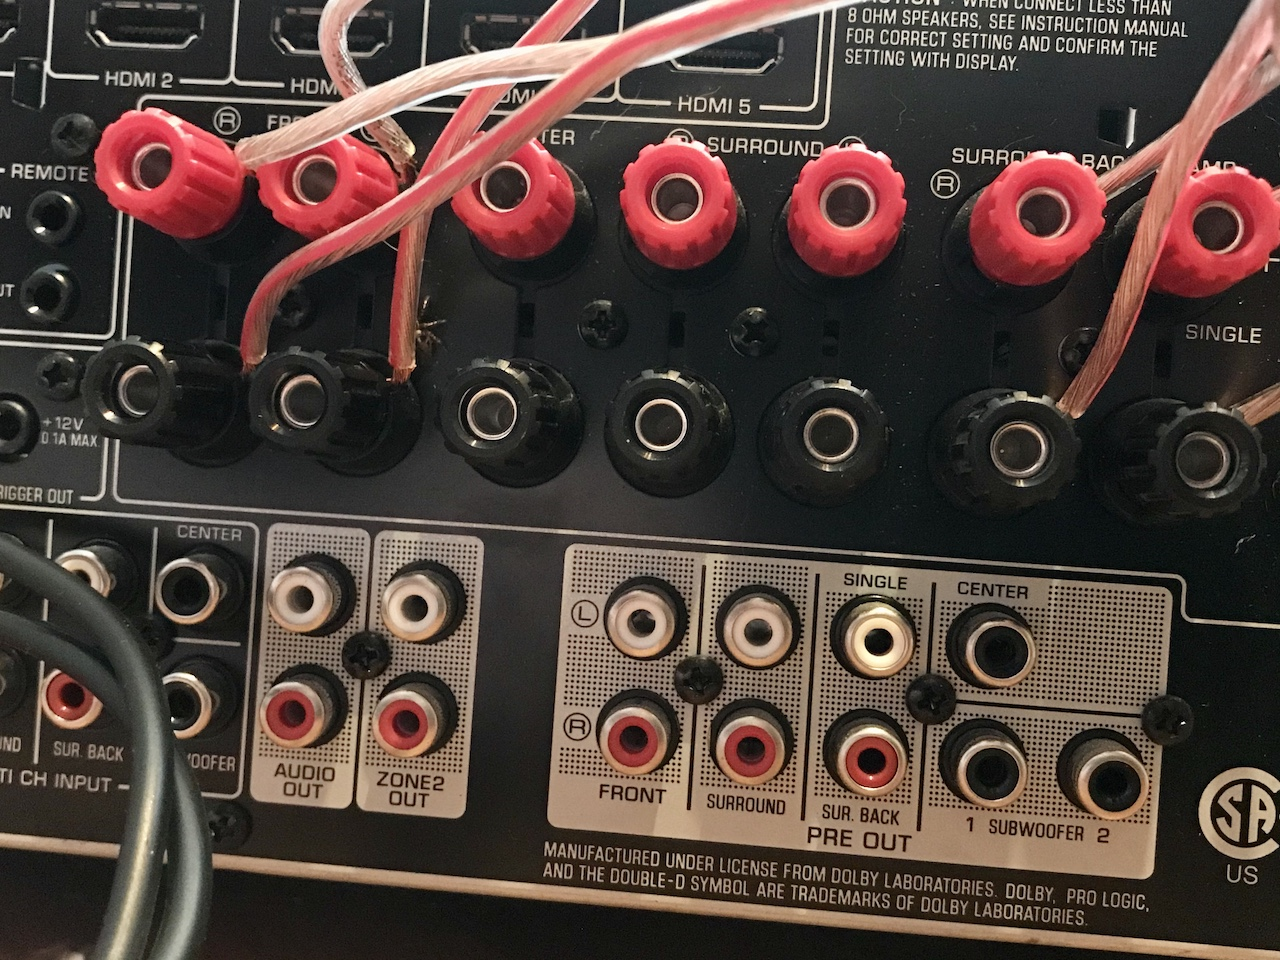 6 More Back of Yamaha.jpg